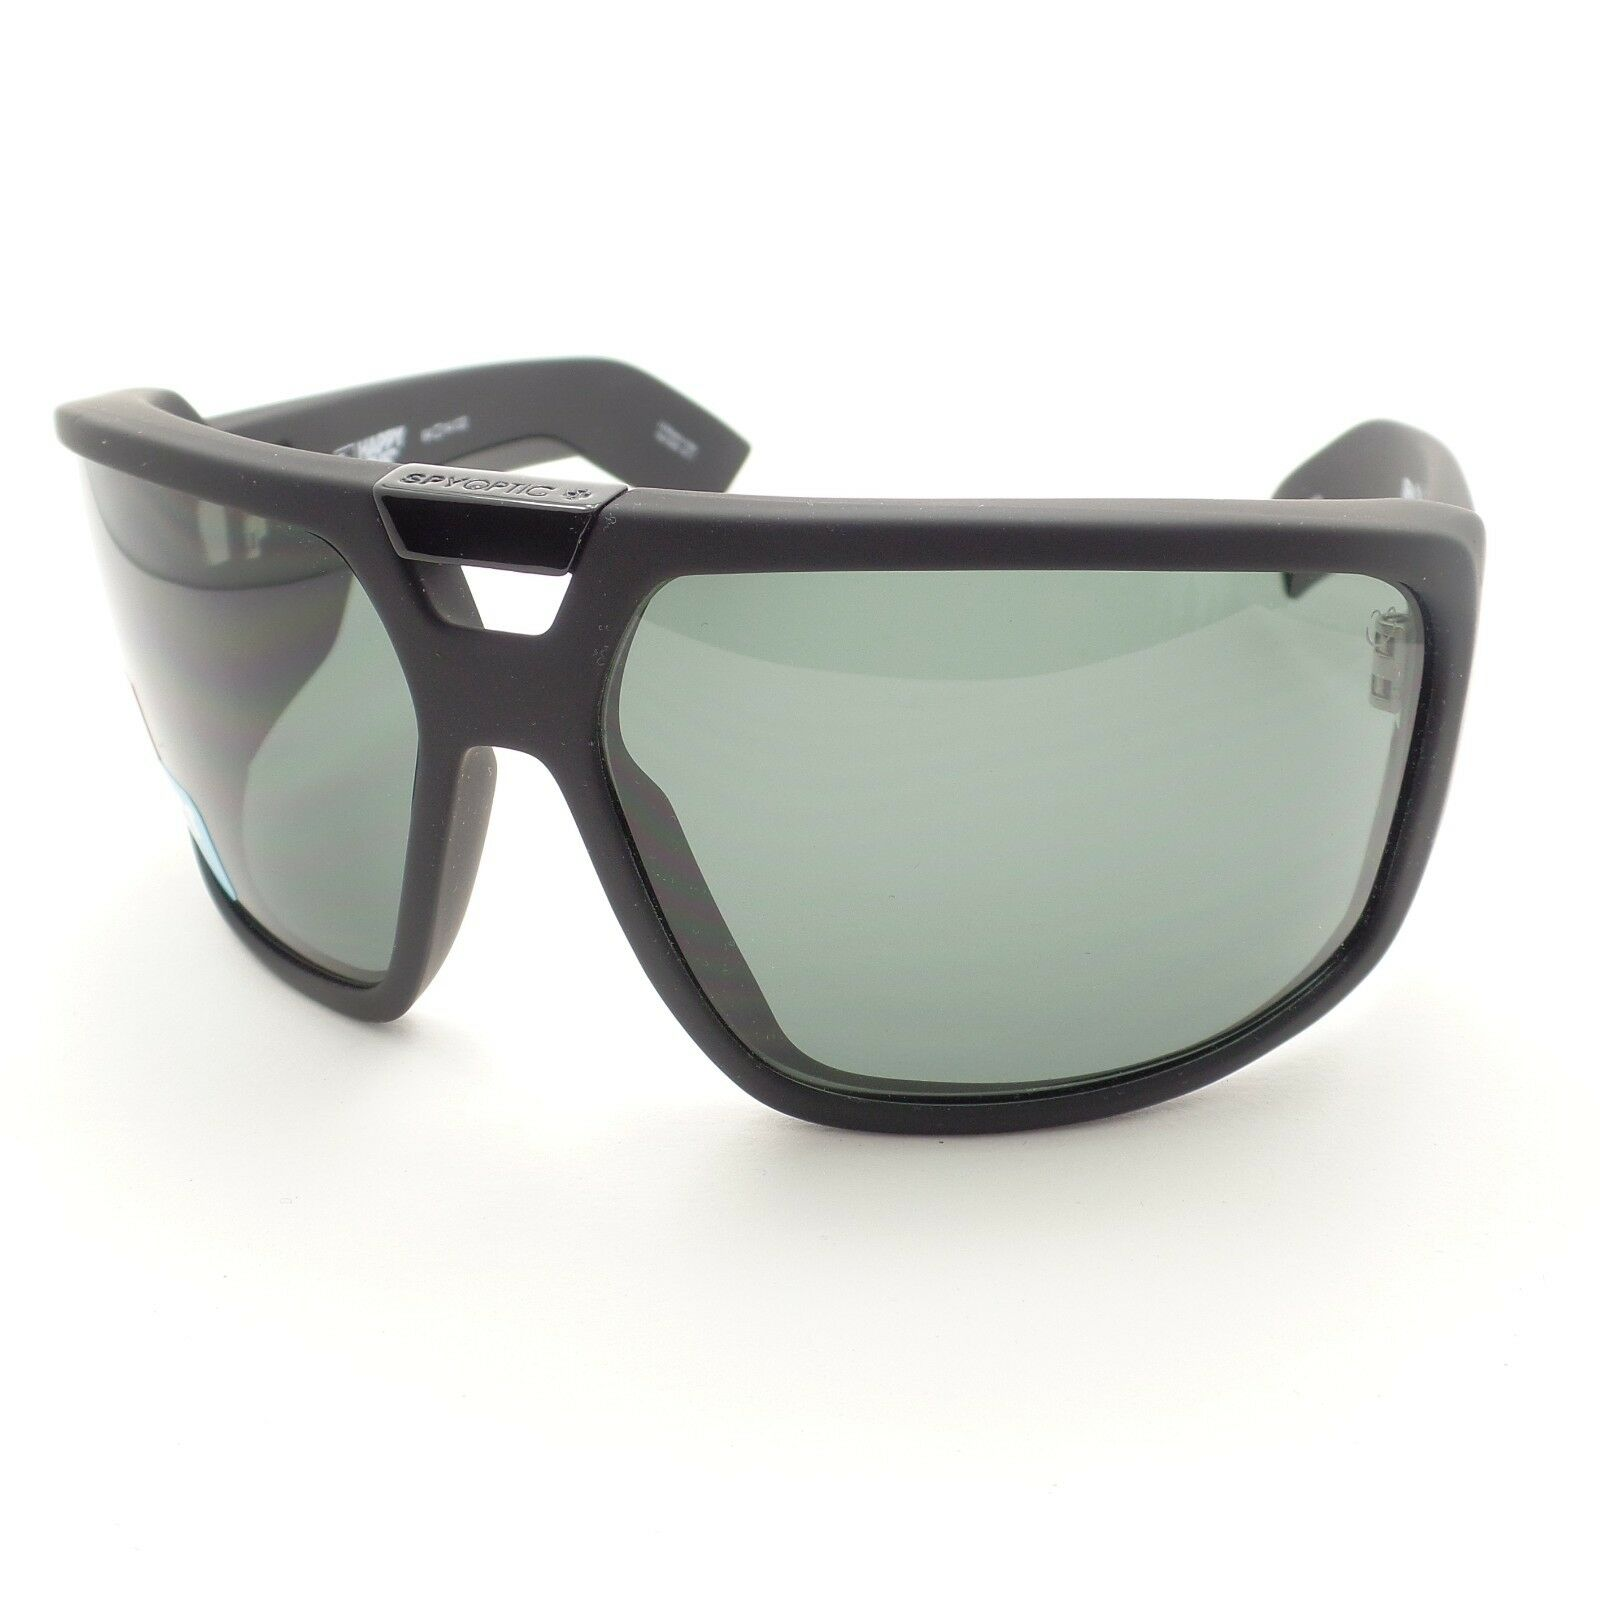 abd2141603 Spy Optics Touring Matte Black Happy Gray Green New Sunglasses Authentic